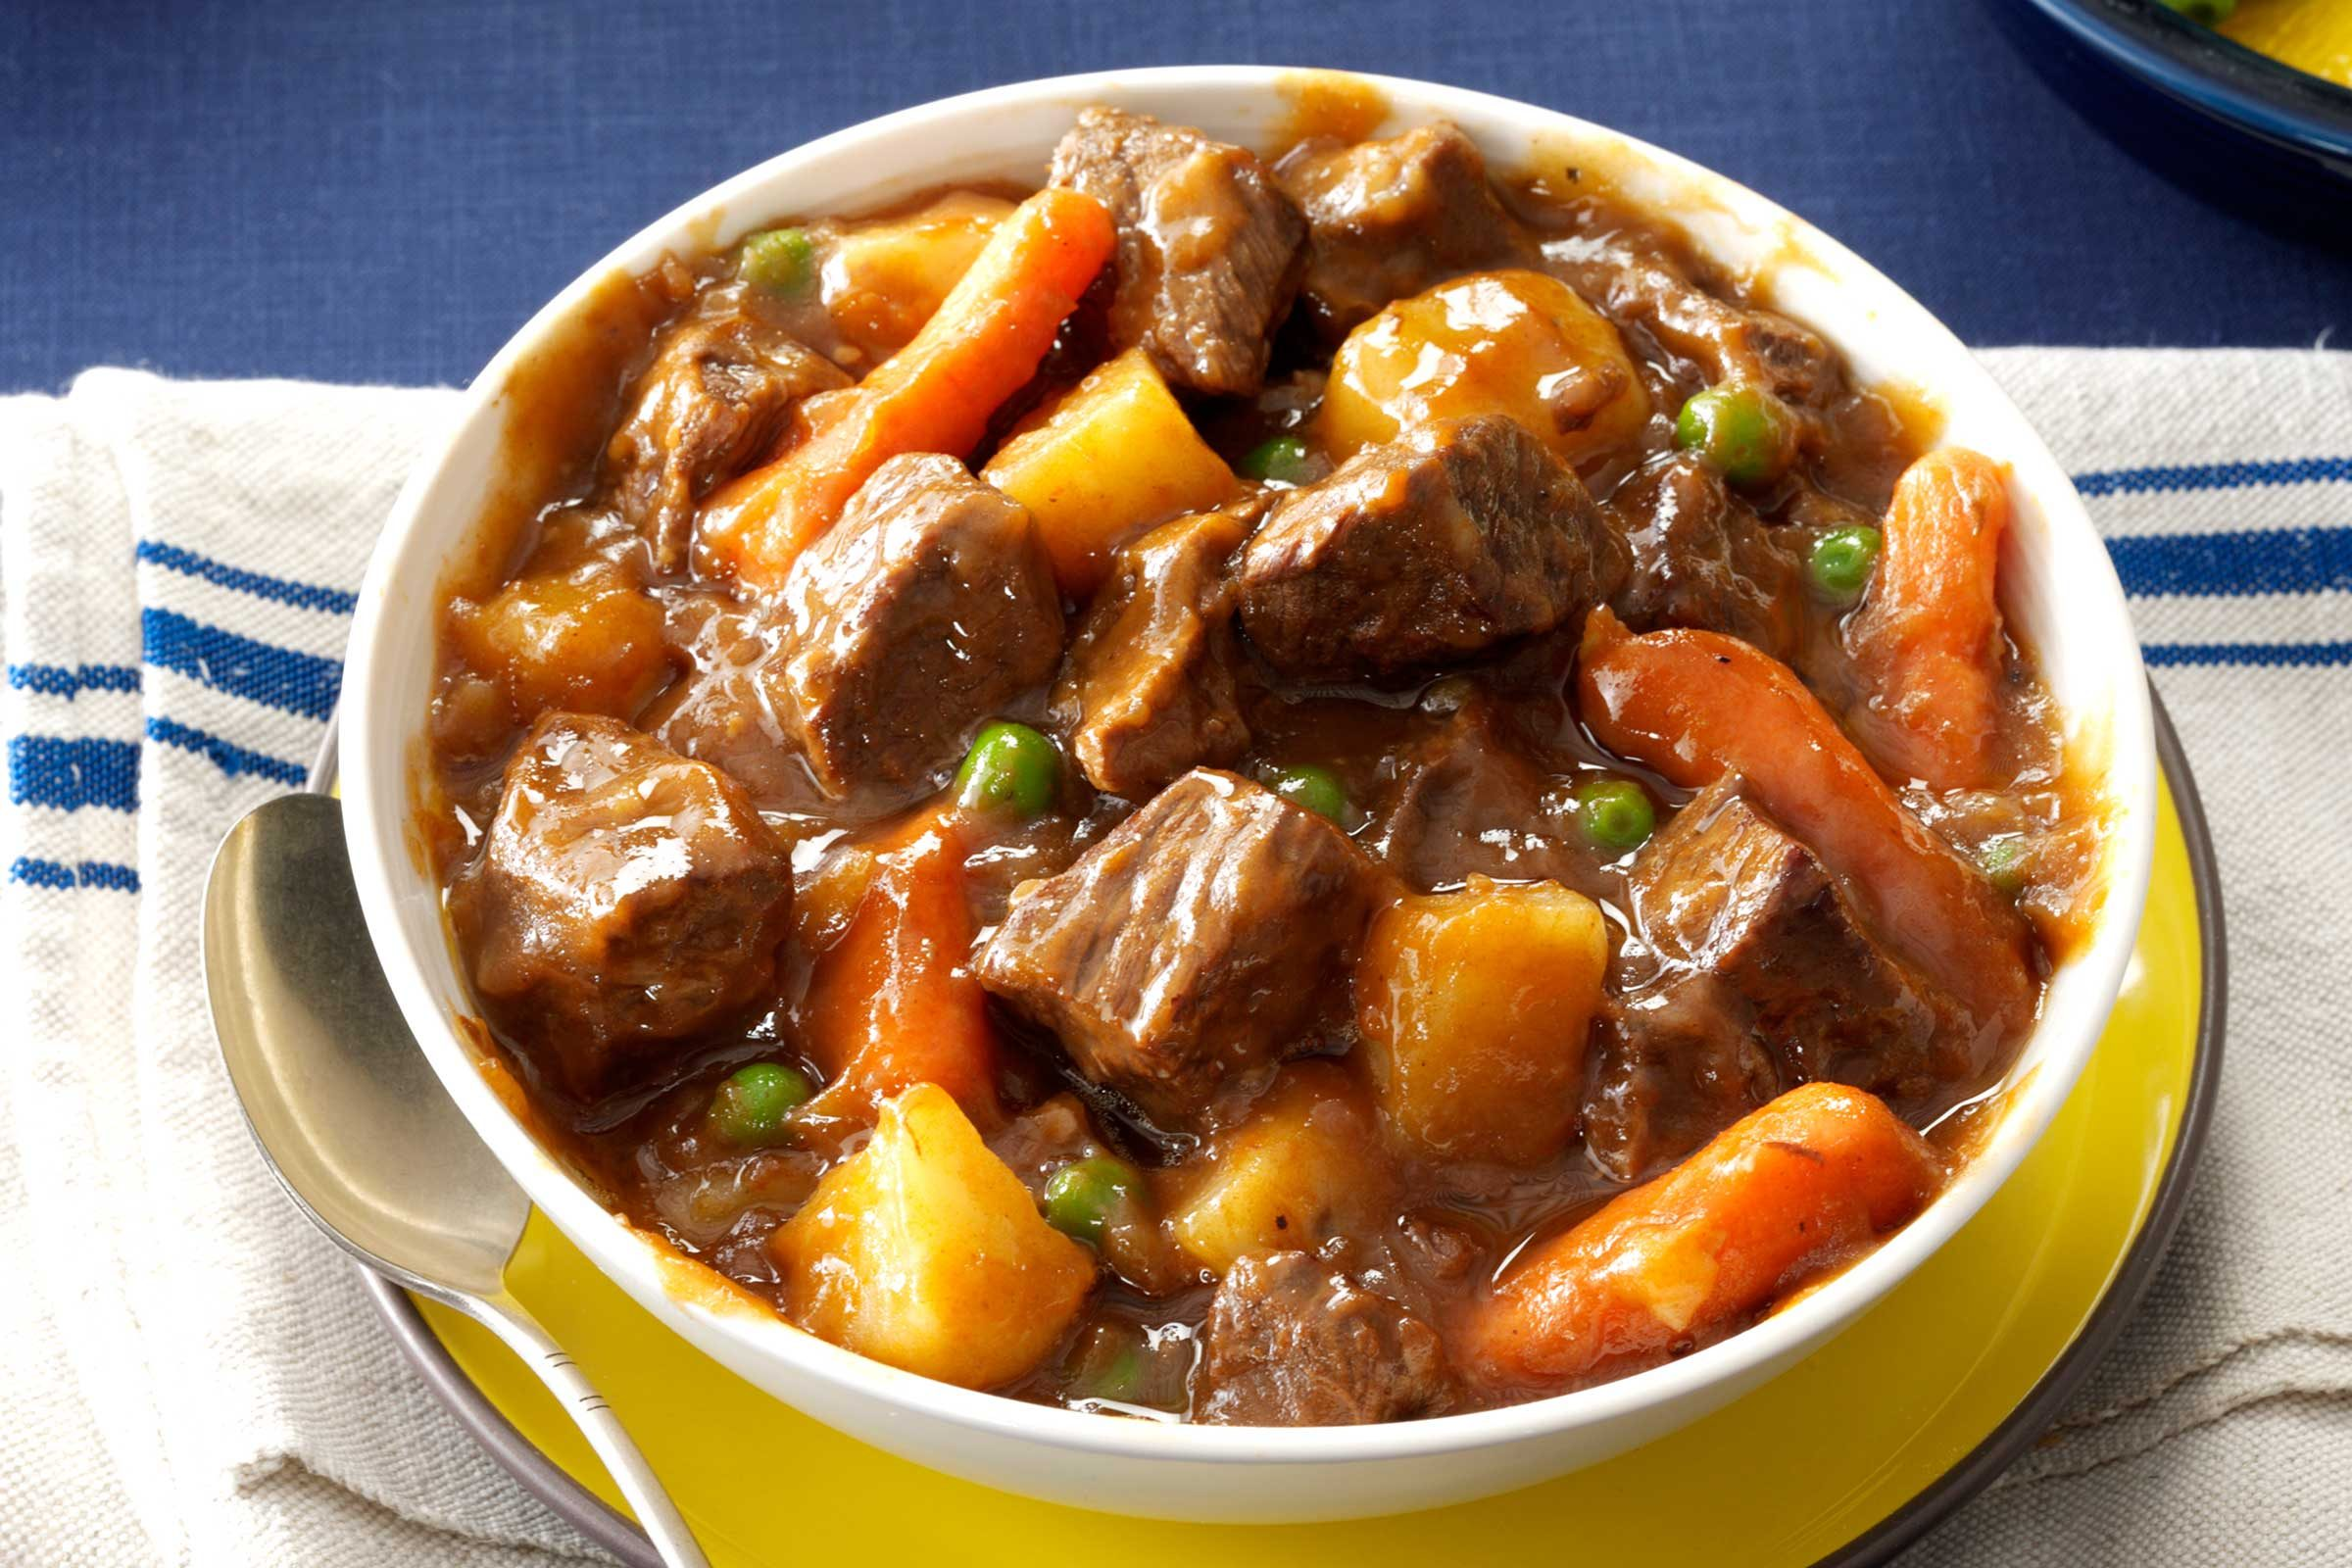 slow-cooker-Slow-Cooker-Beef-Vegetable-Stew.jpg